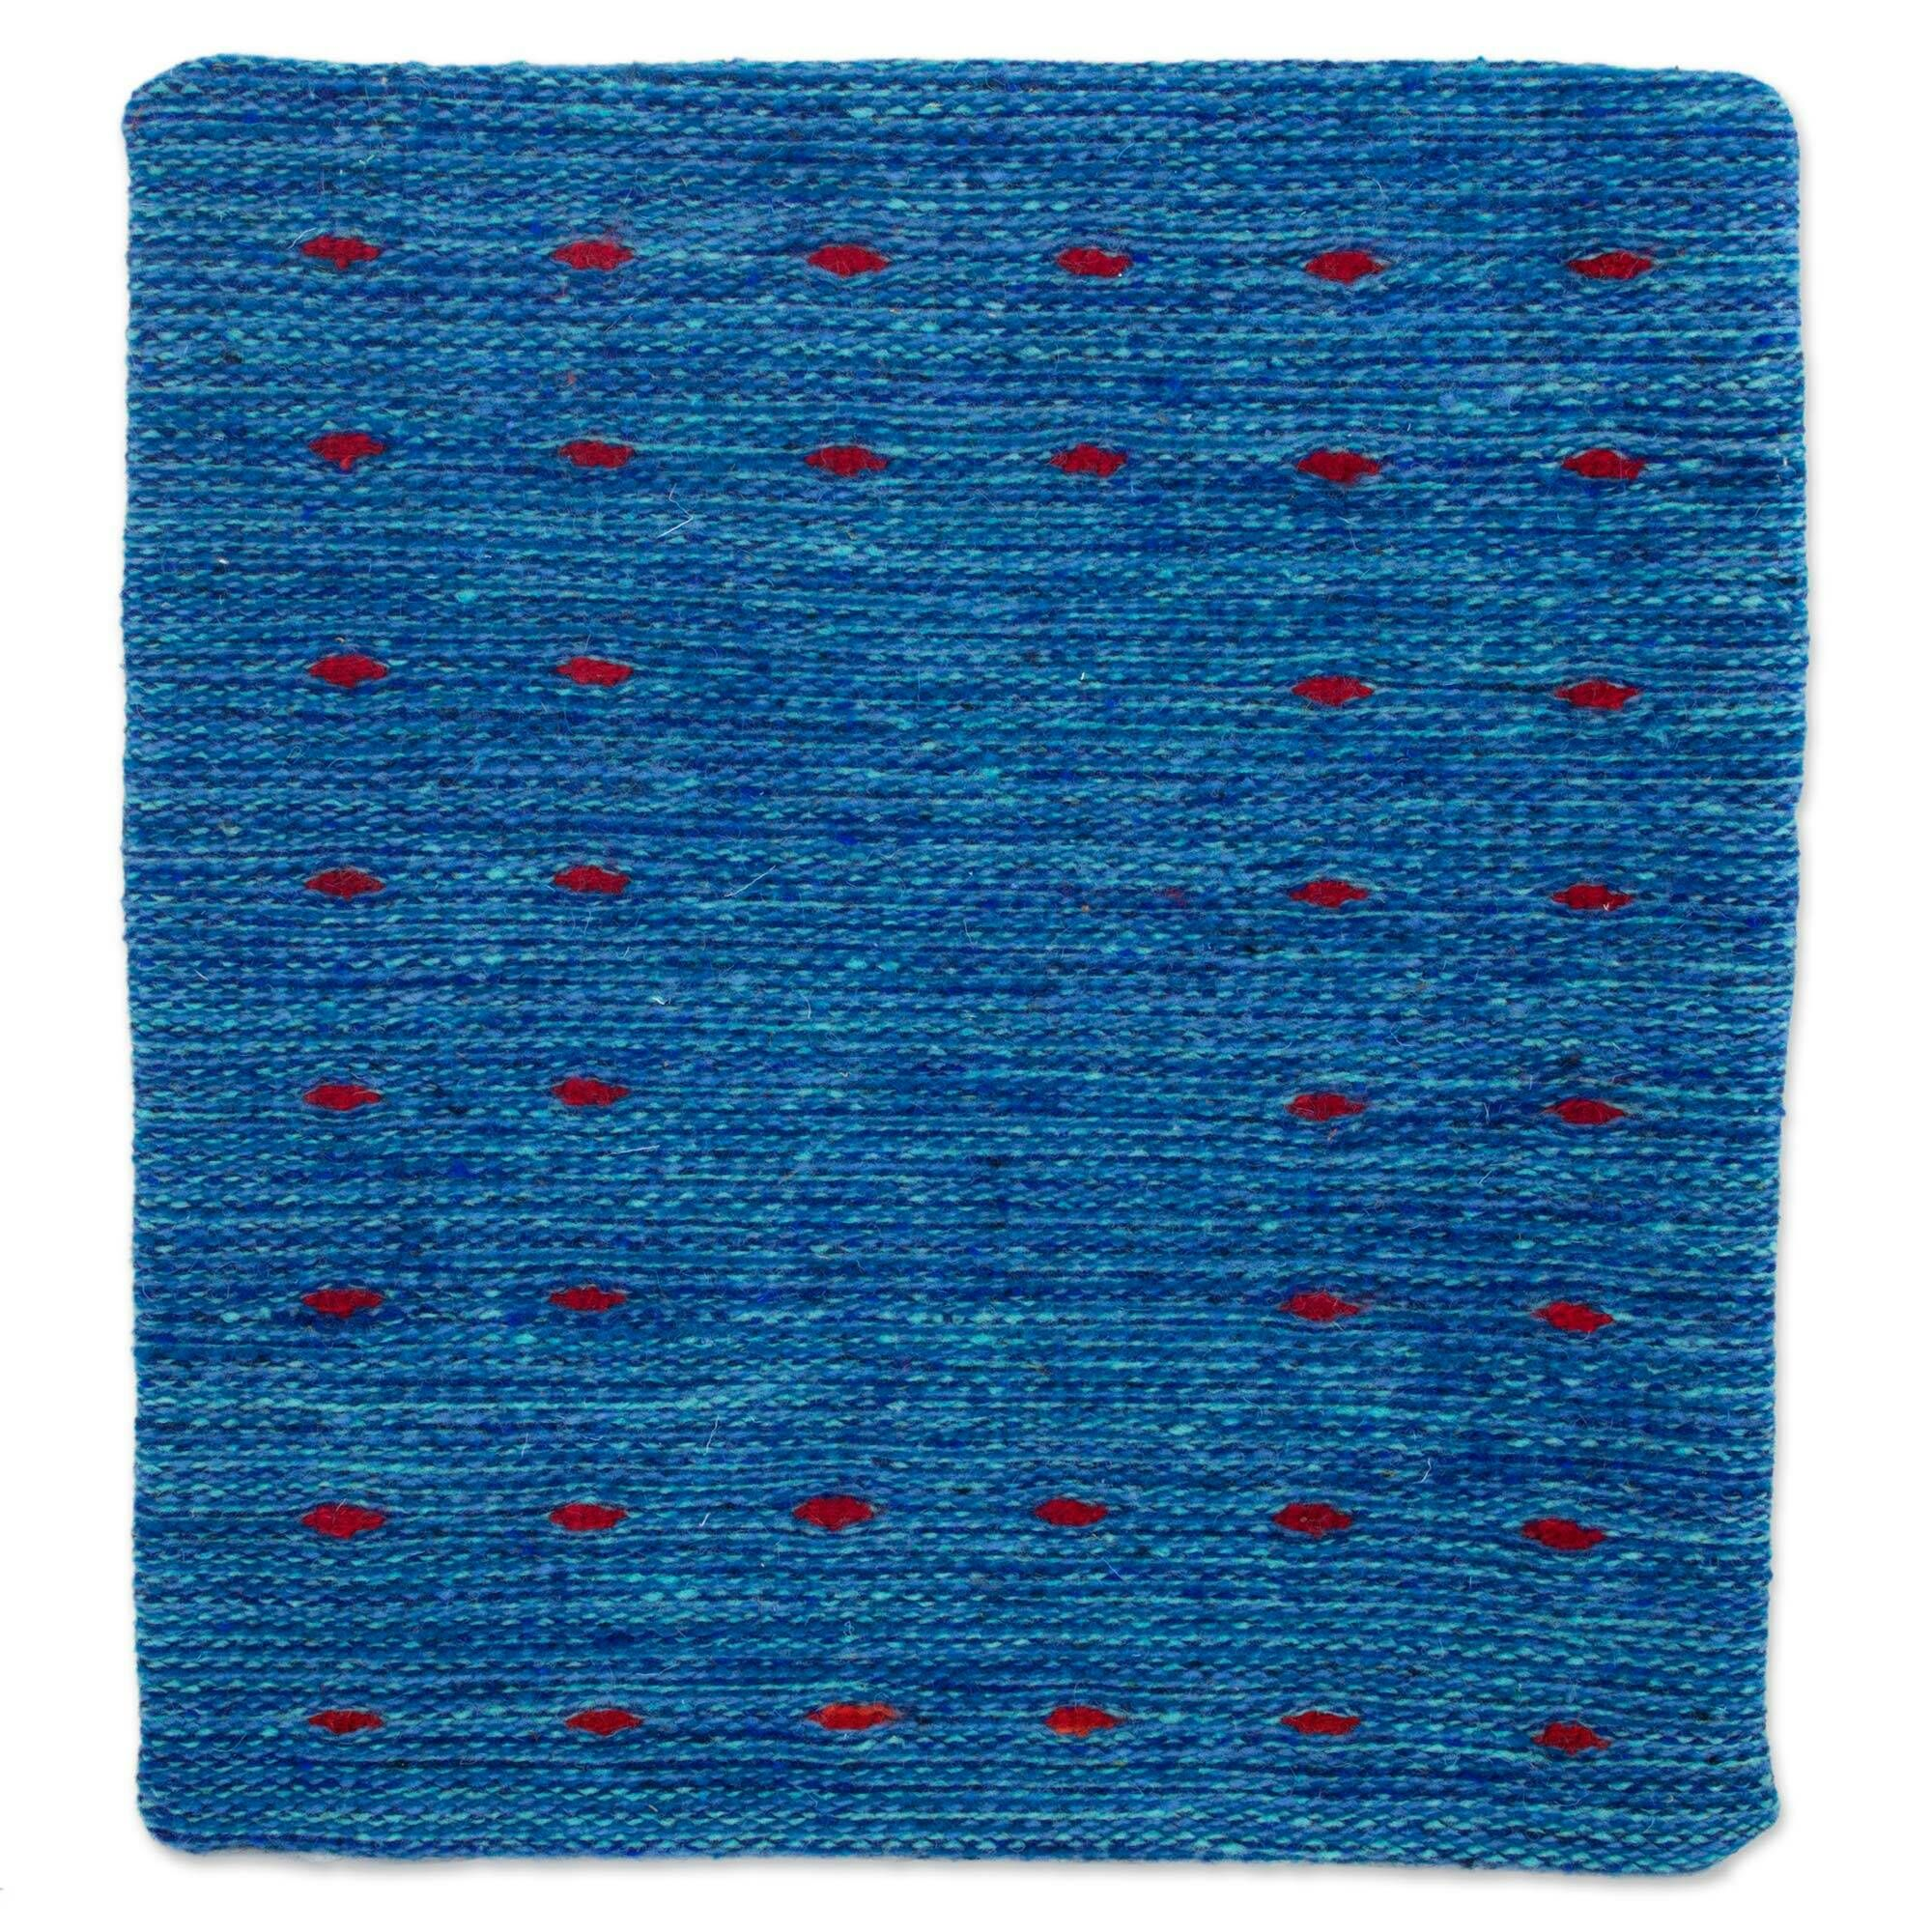 Masse Sky Of Oaxaca Wool Pillow Cover